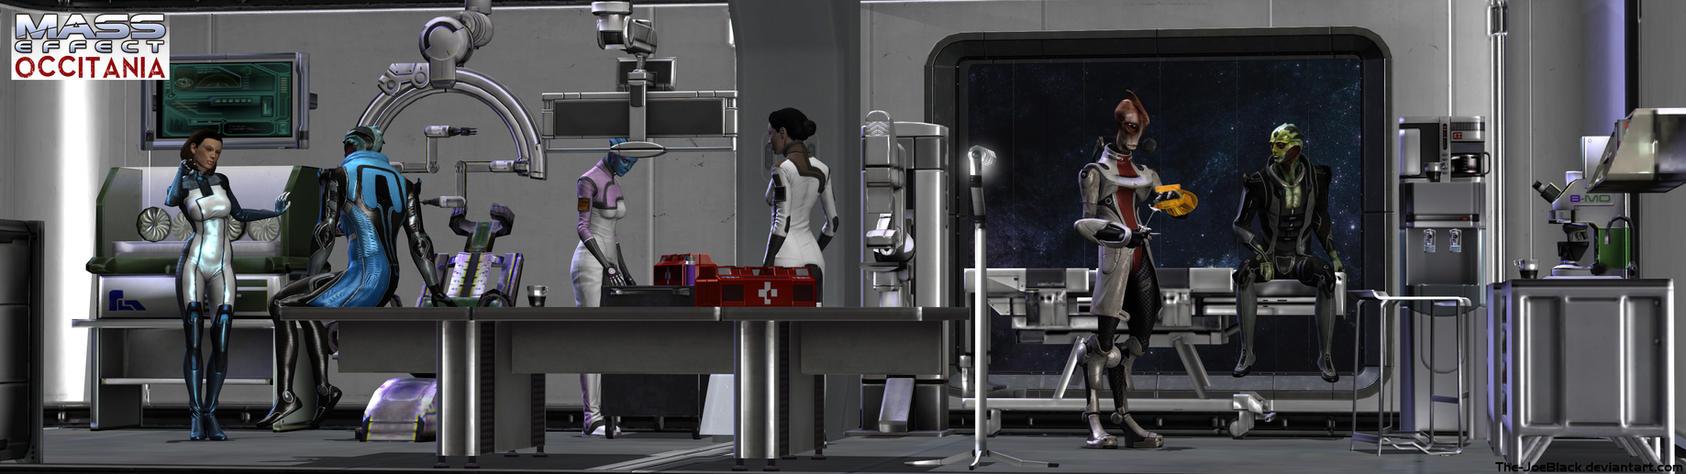 Mass Effect - Occitania: The Medlab by The-JoeBlack